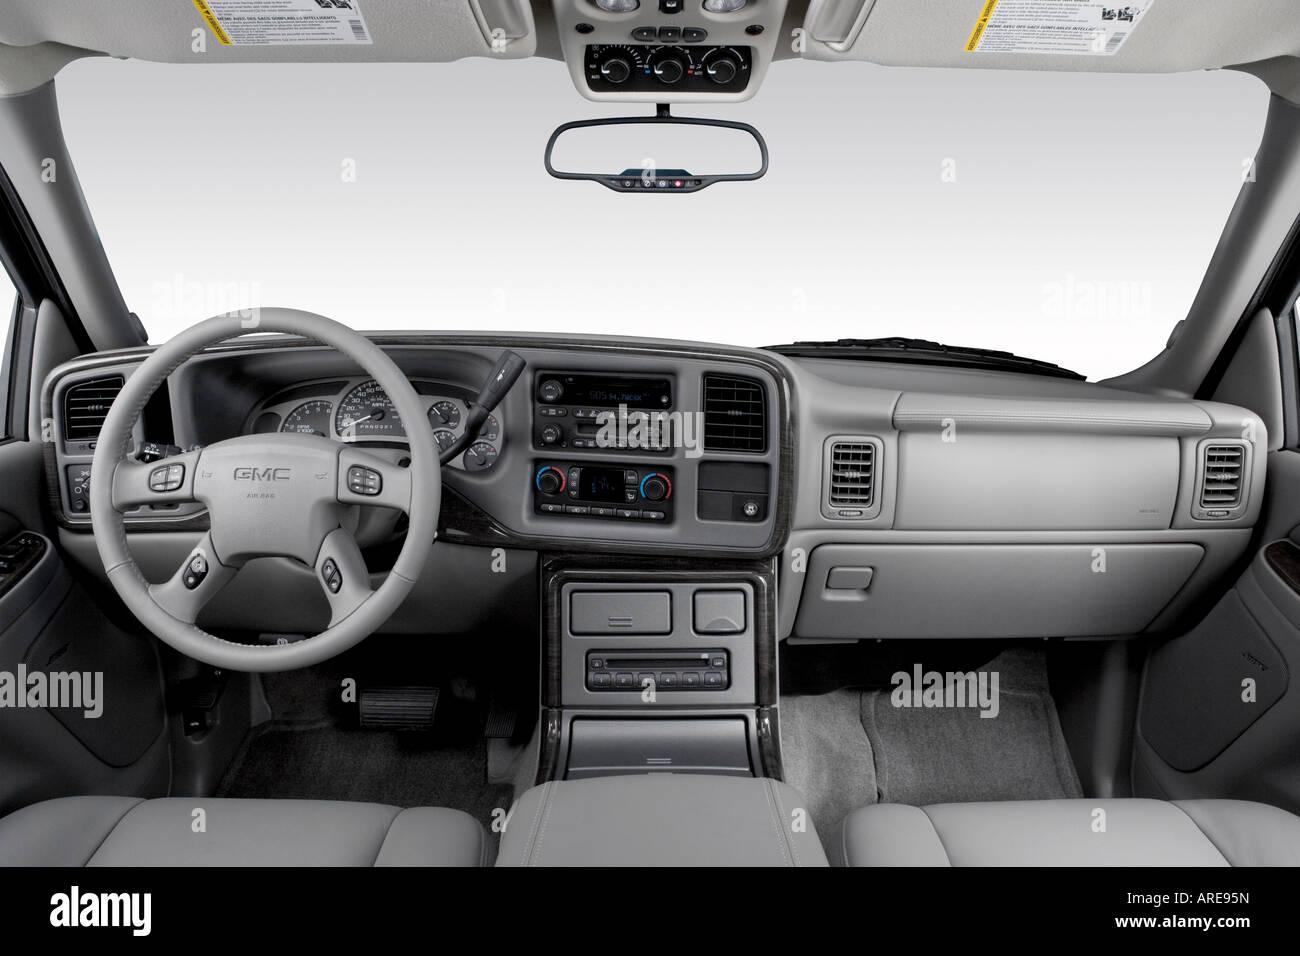 hight resolution of 2006 gmc yukon xl 1500 denali in black dashboard center console gear shifter view